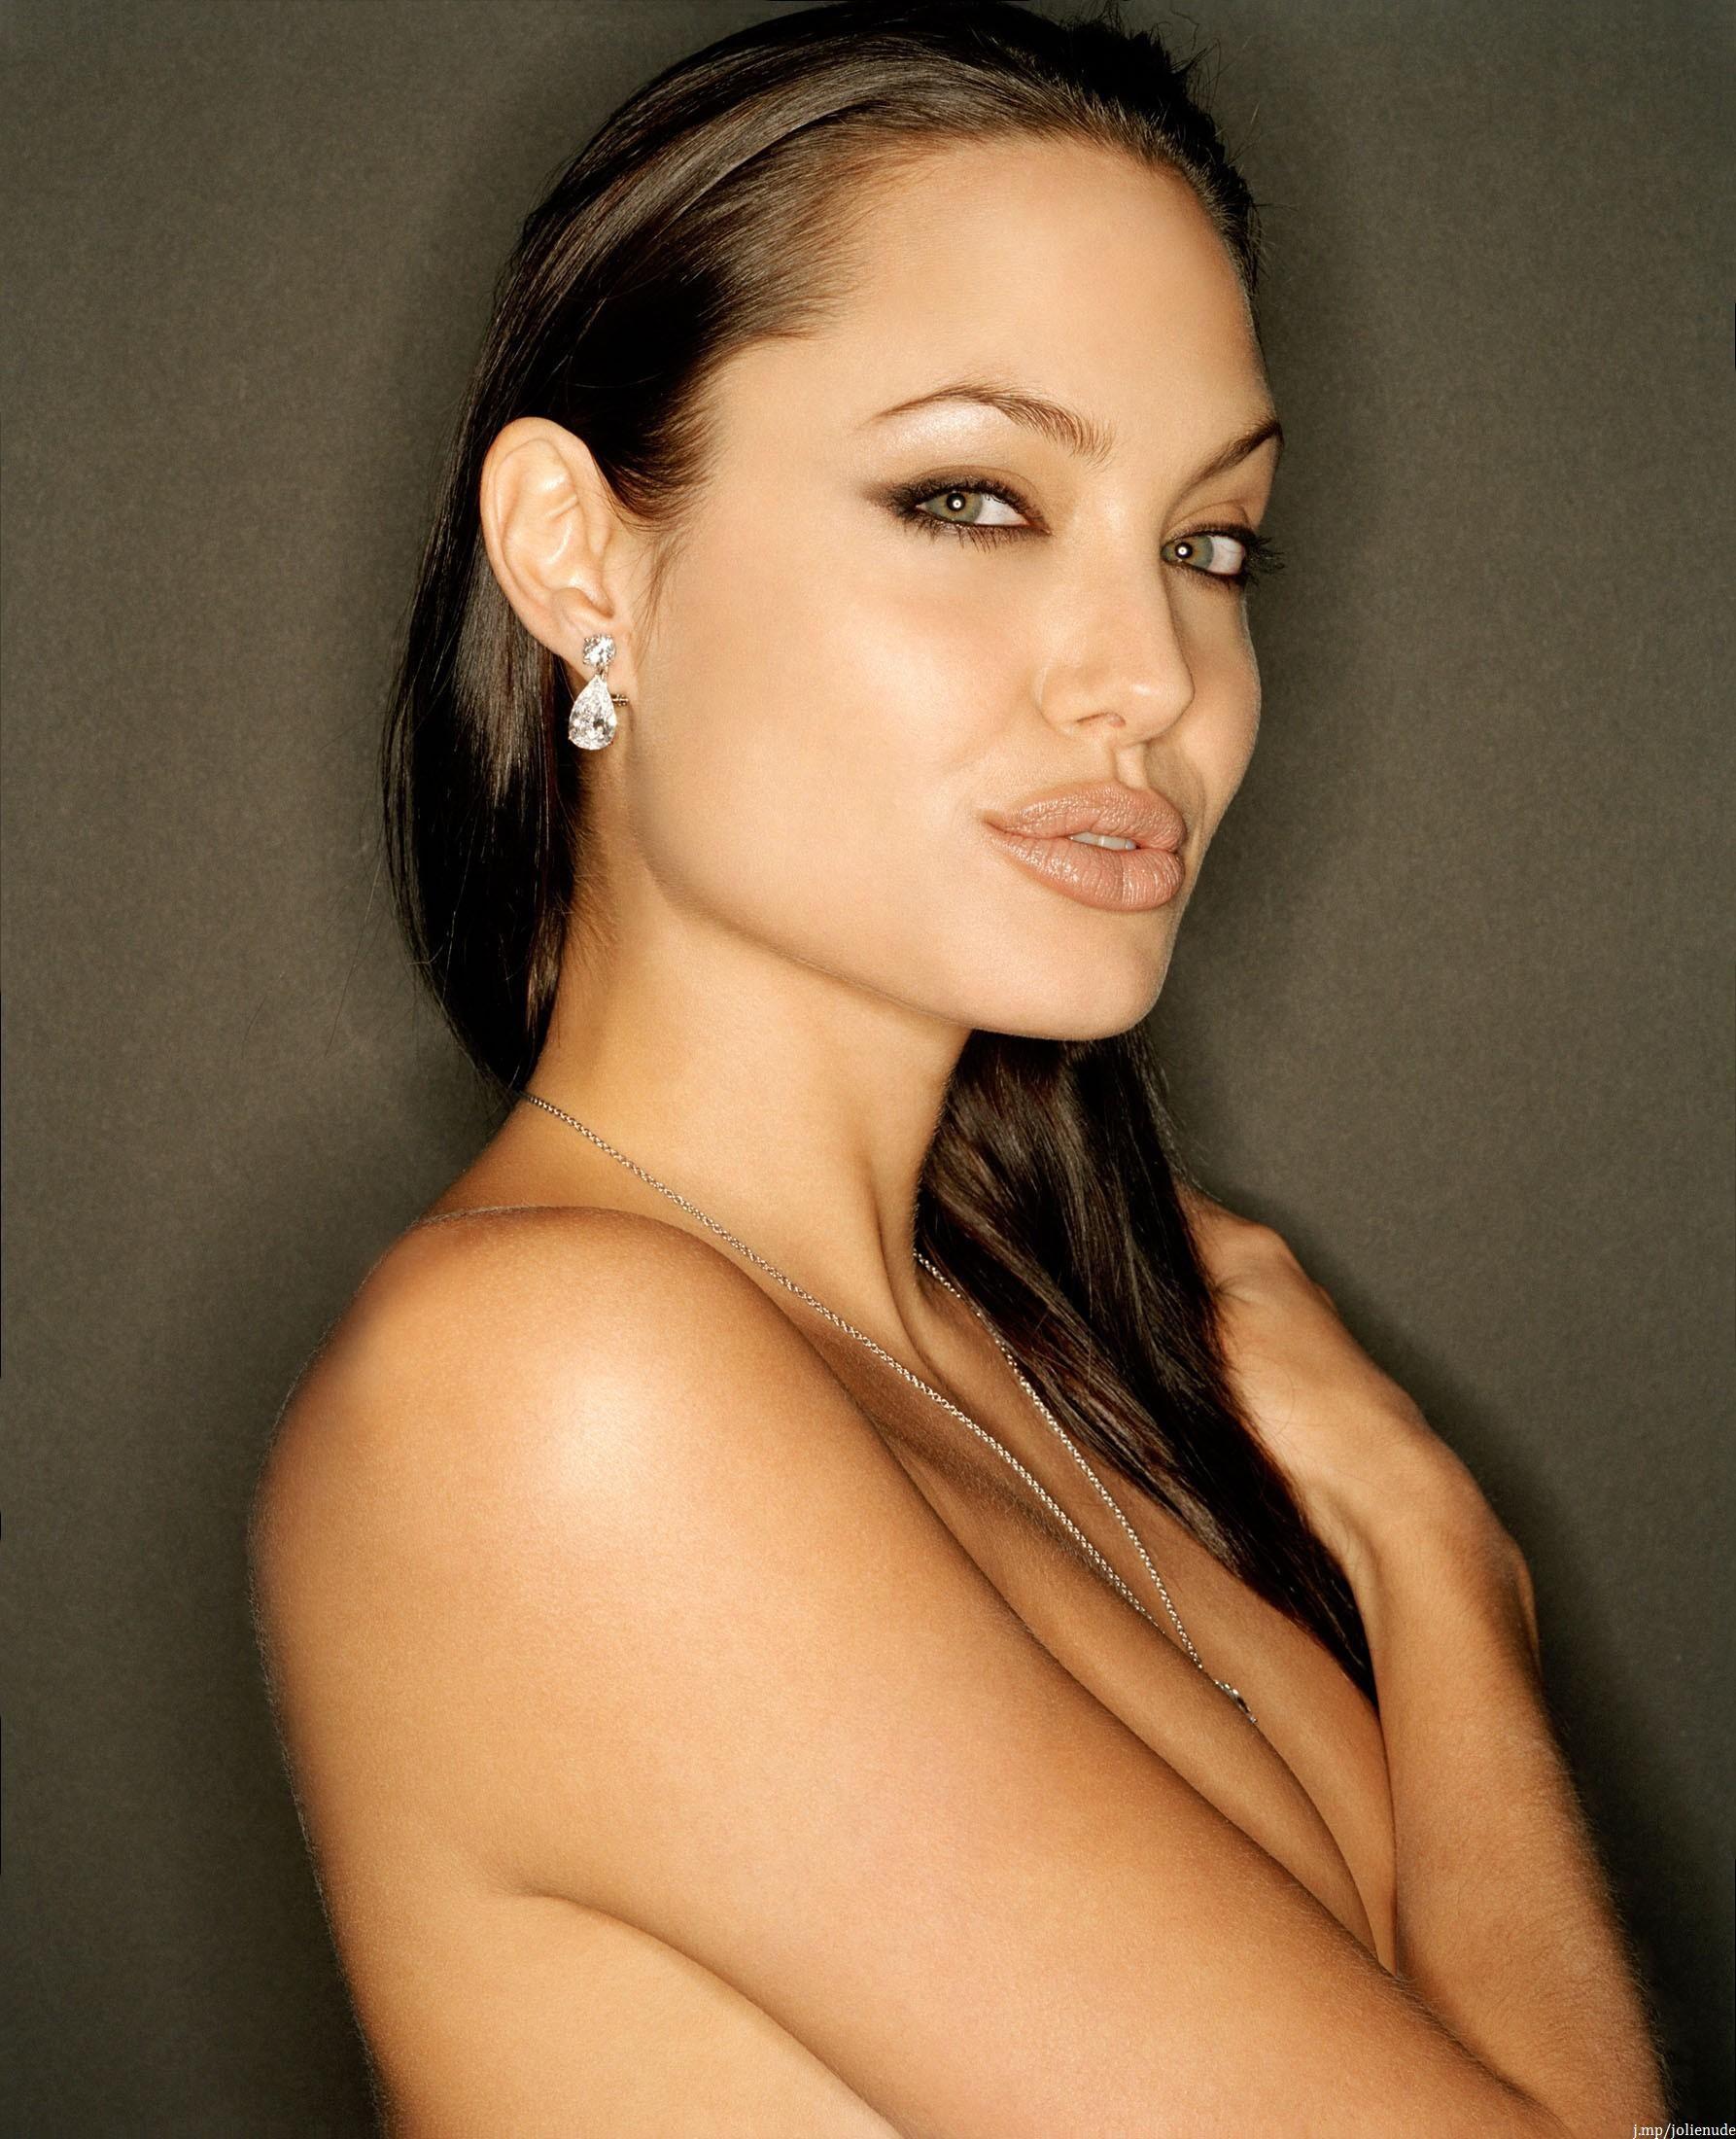 Angelina Jolie Naked Photo Shoot 112